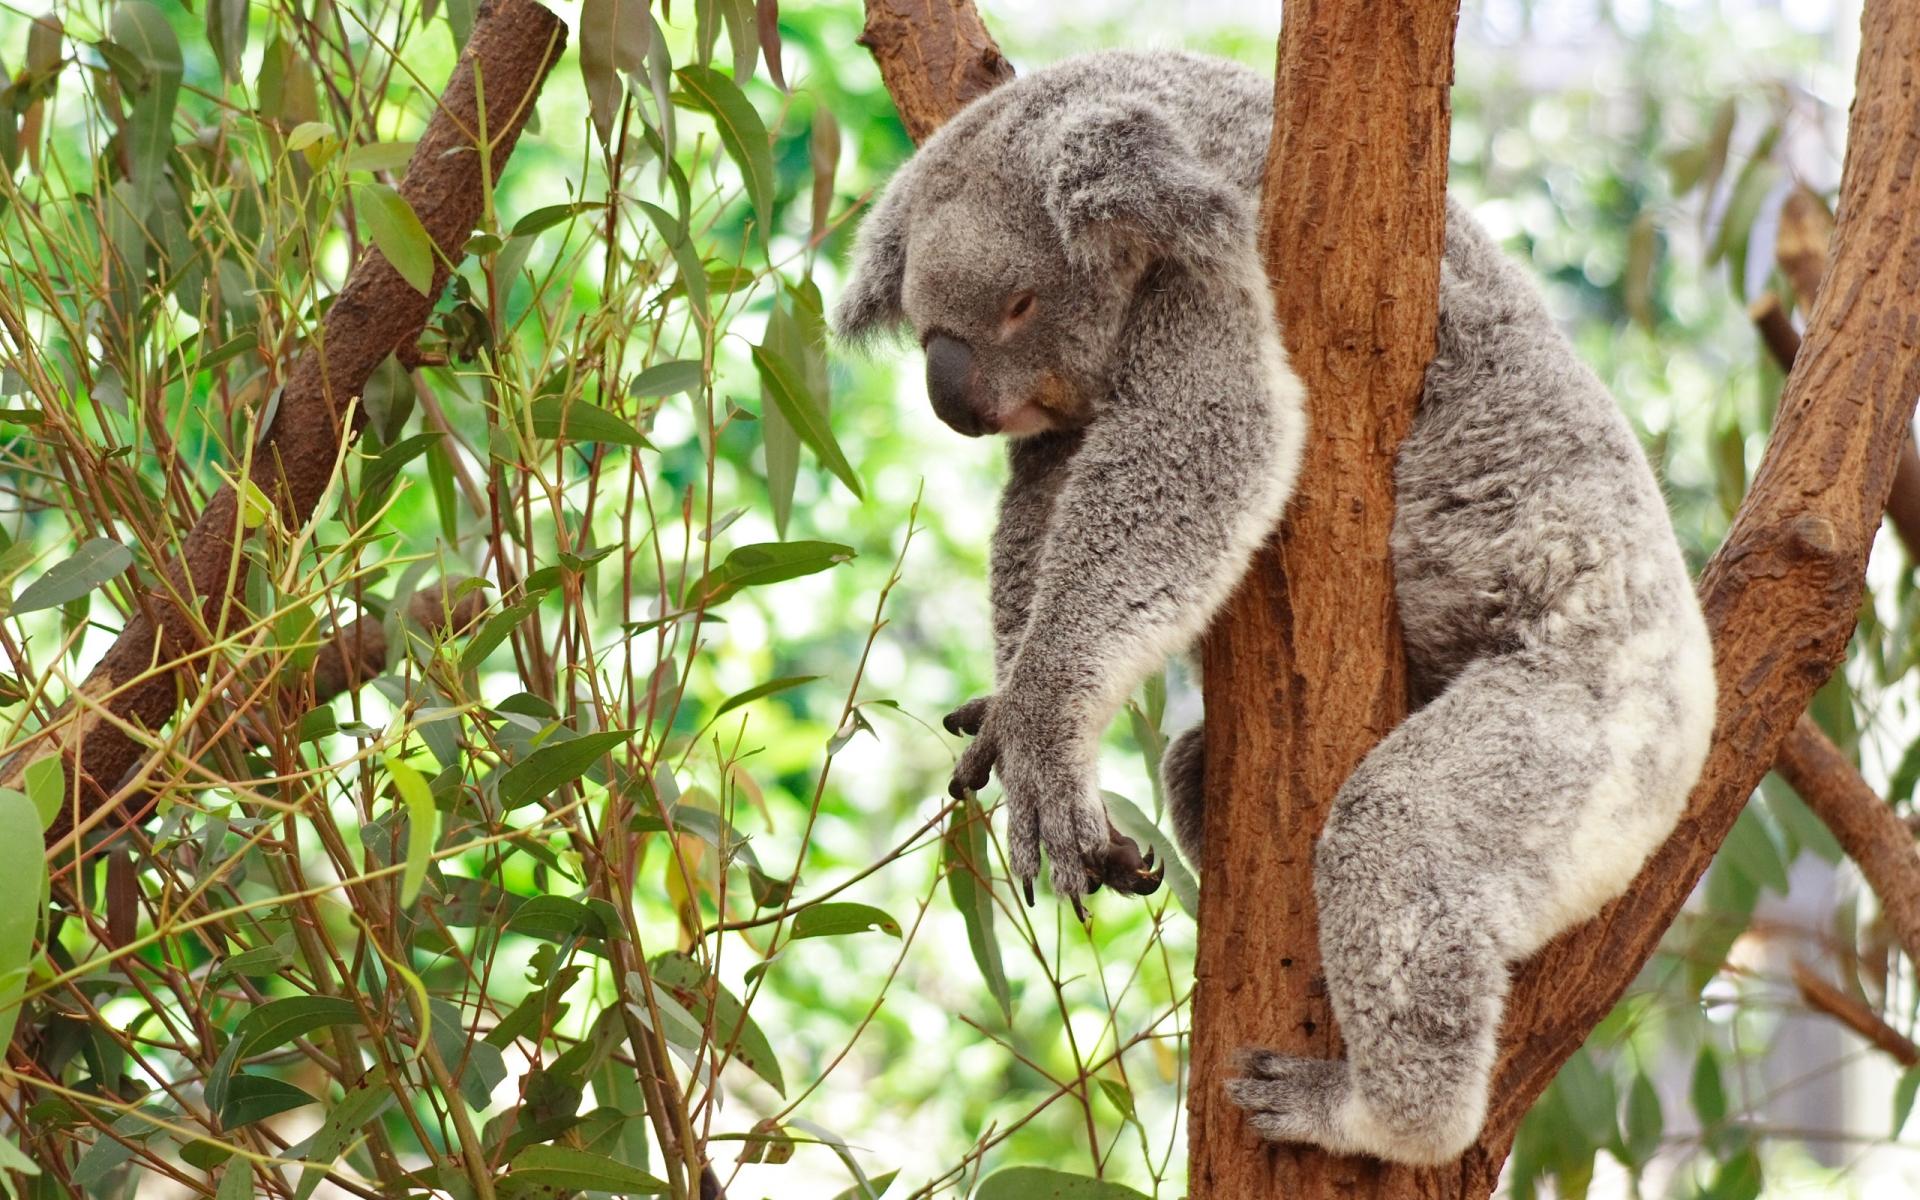 Koala Baby Wallpaper Koala Wallpaper 1920x1200